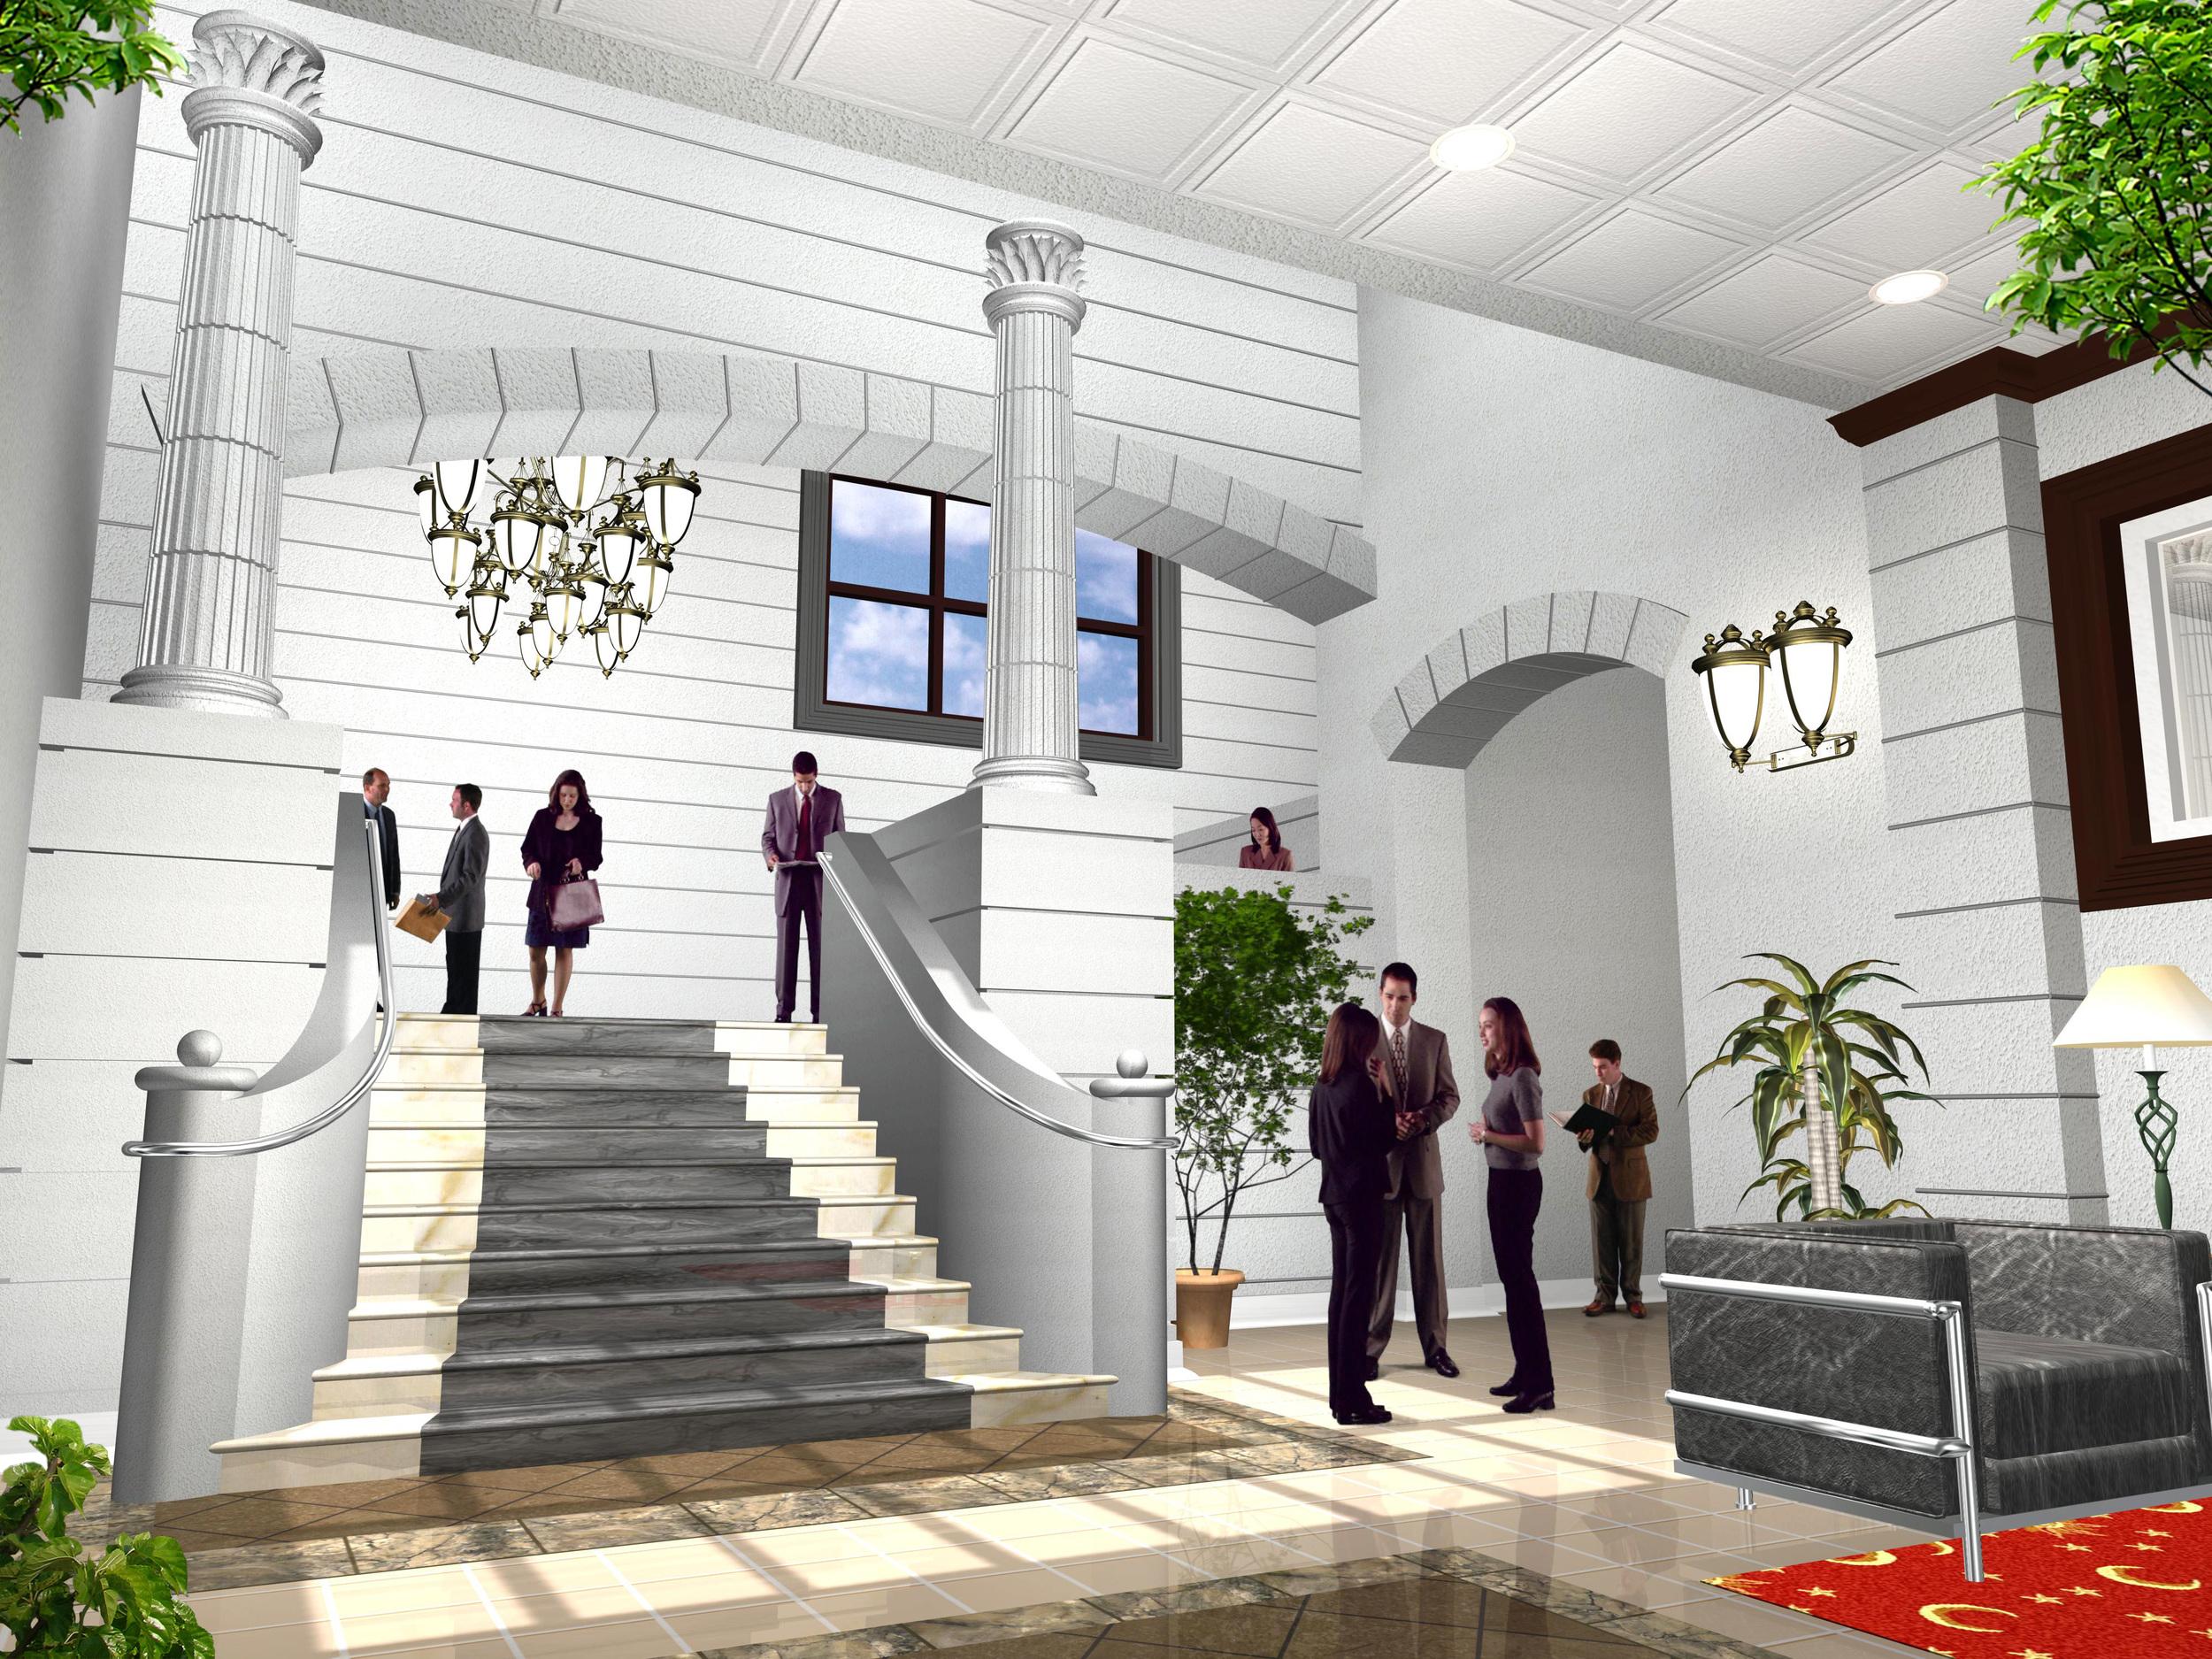 interior-stair2.jpg